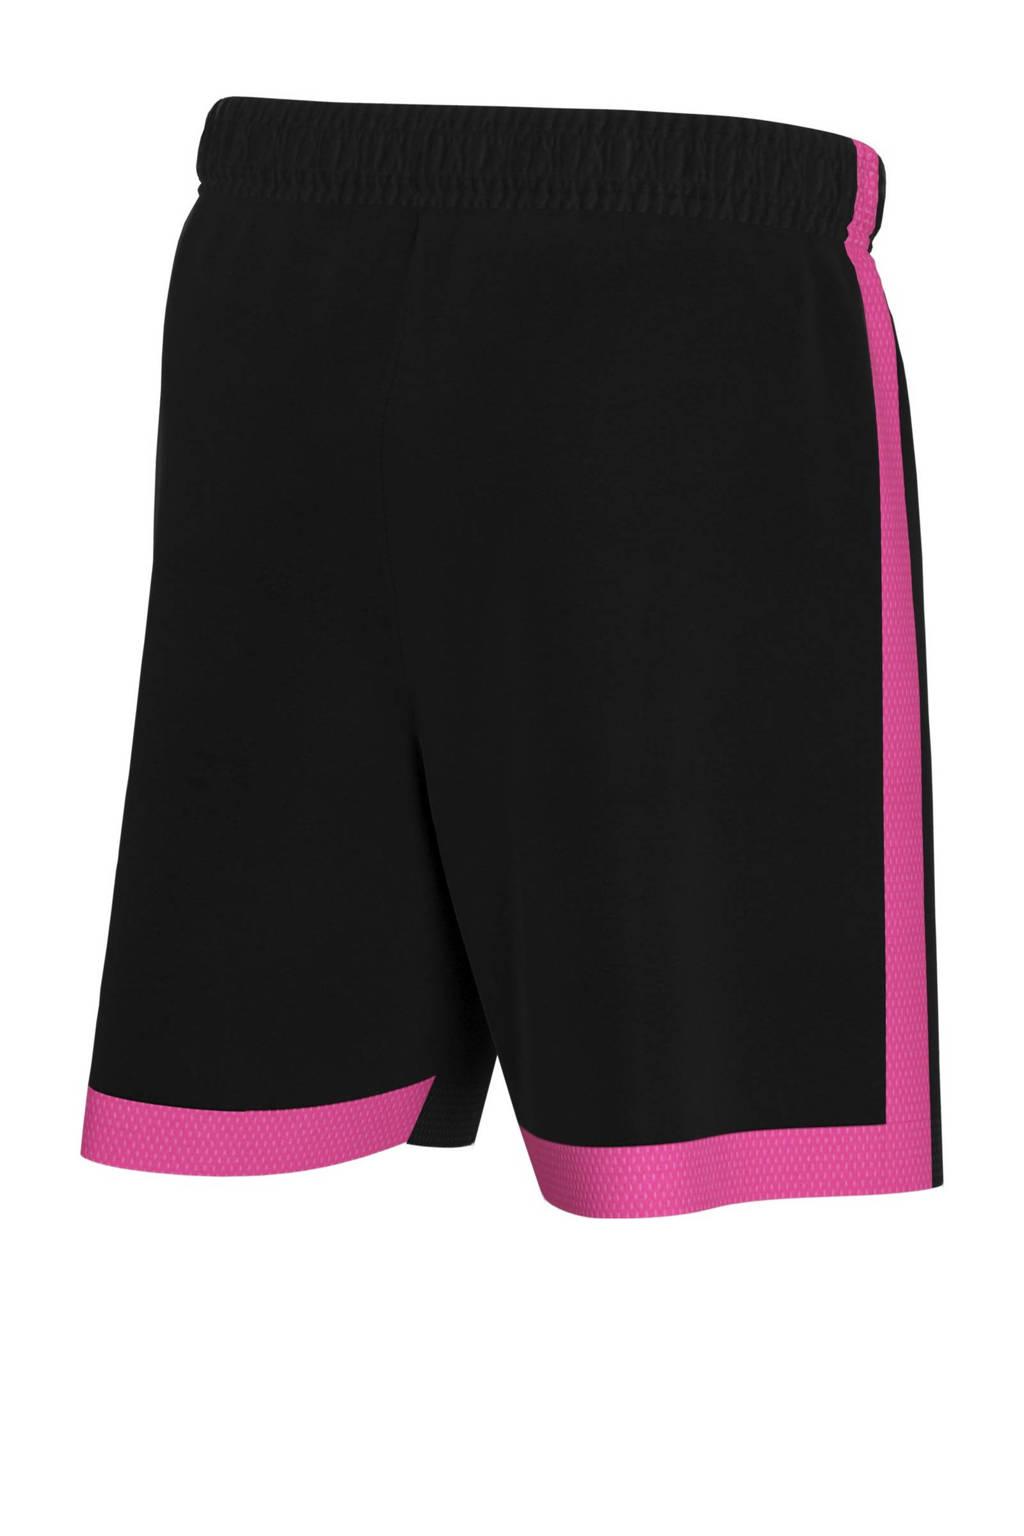 Nike Junior  voetbalshort zwart/roze, Zwart/roze